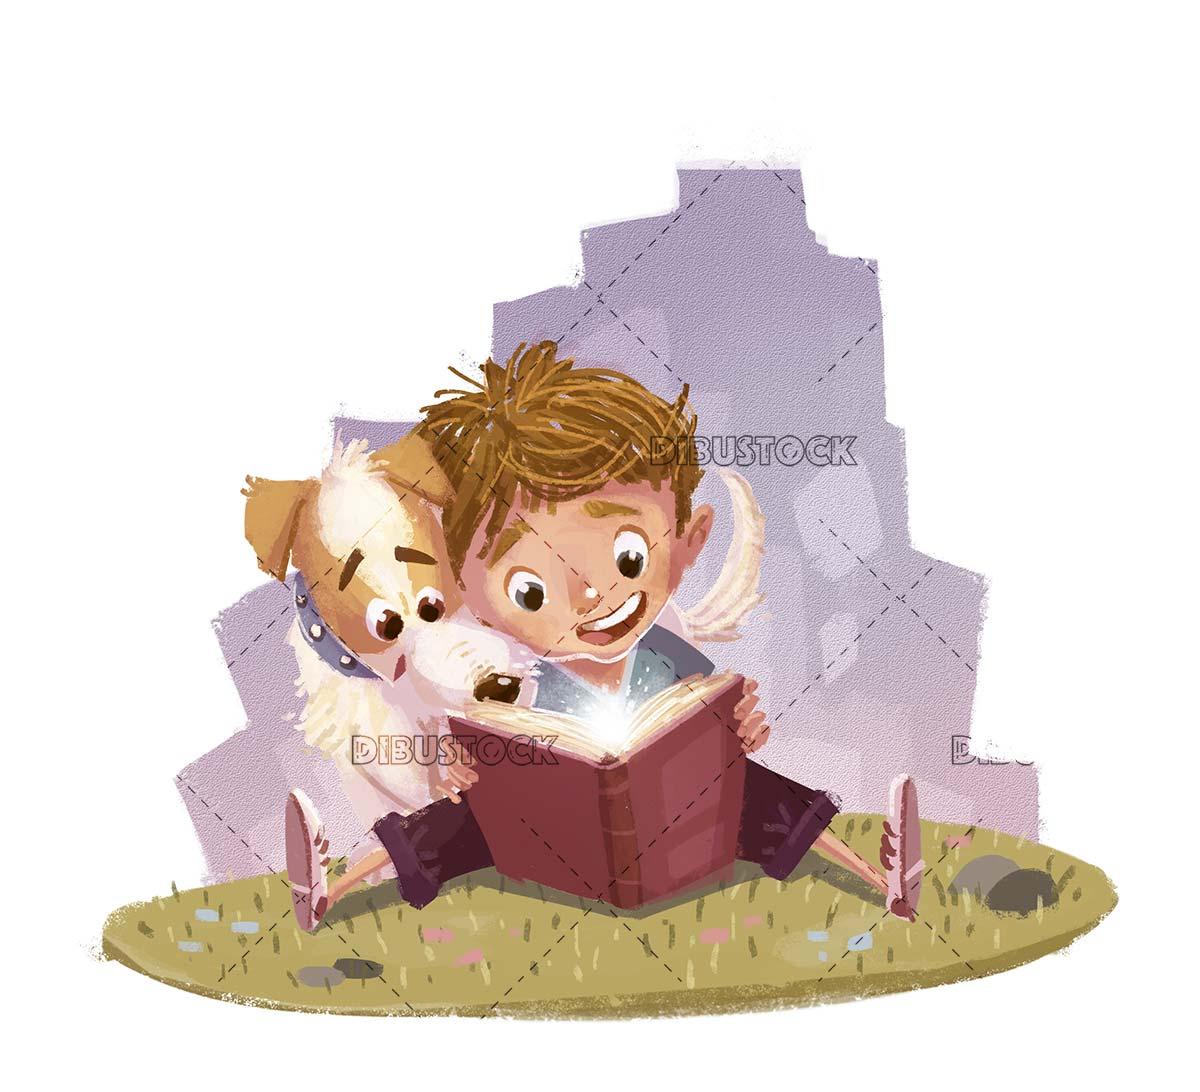 Dog and boy reading a fantasy book